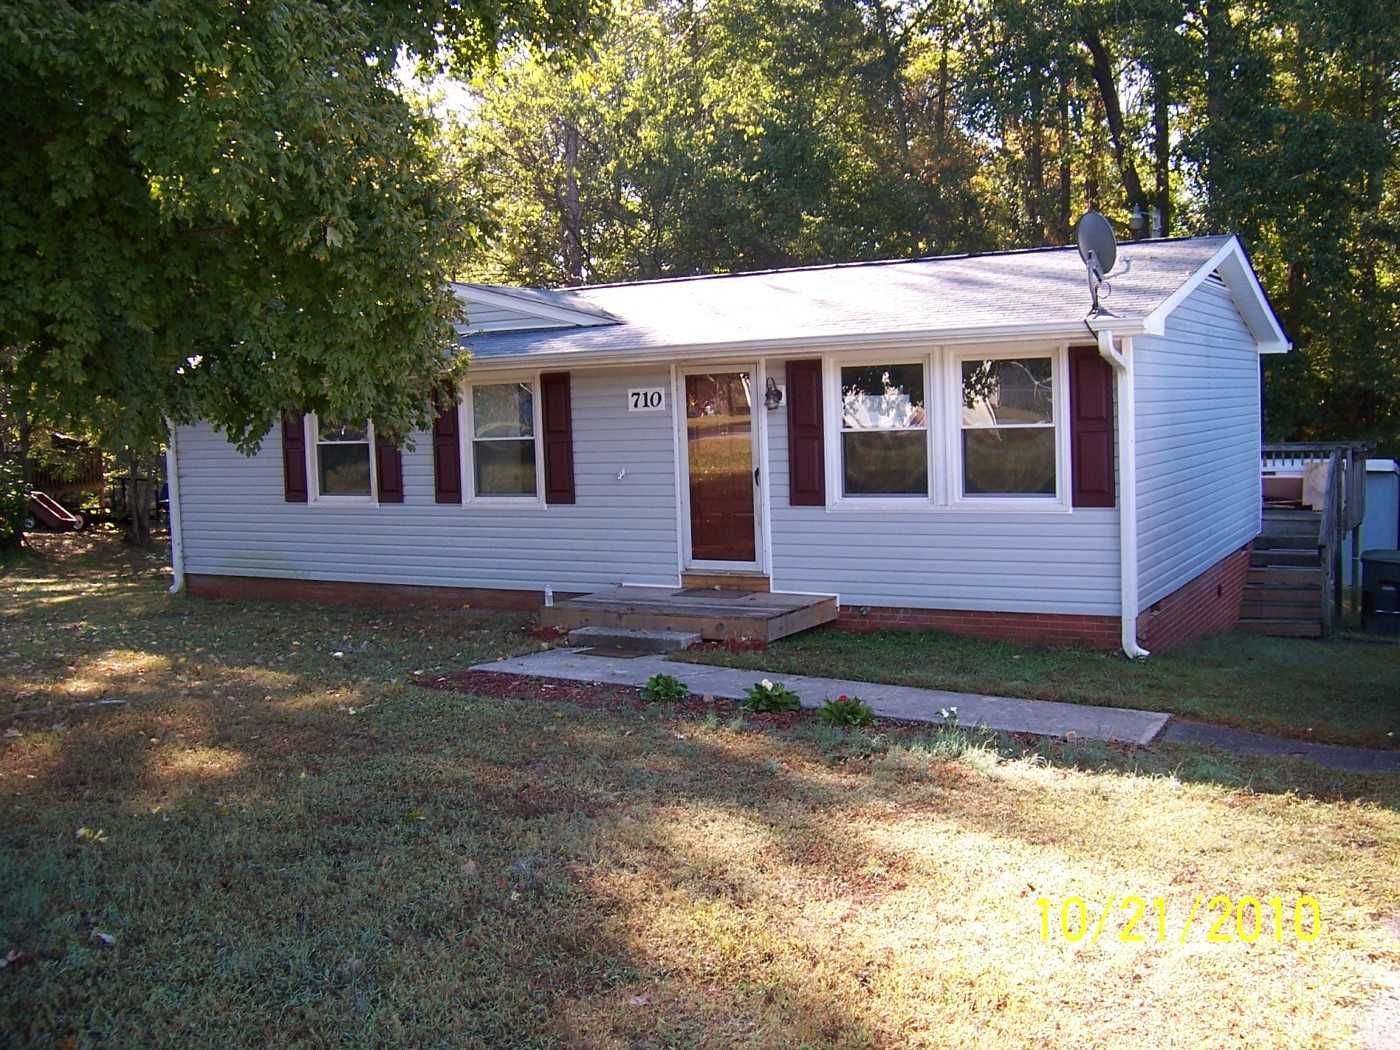 Nice Quiet Neighborhood Rama Wood Dr Concord Nc Houses For